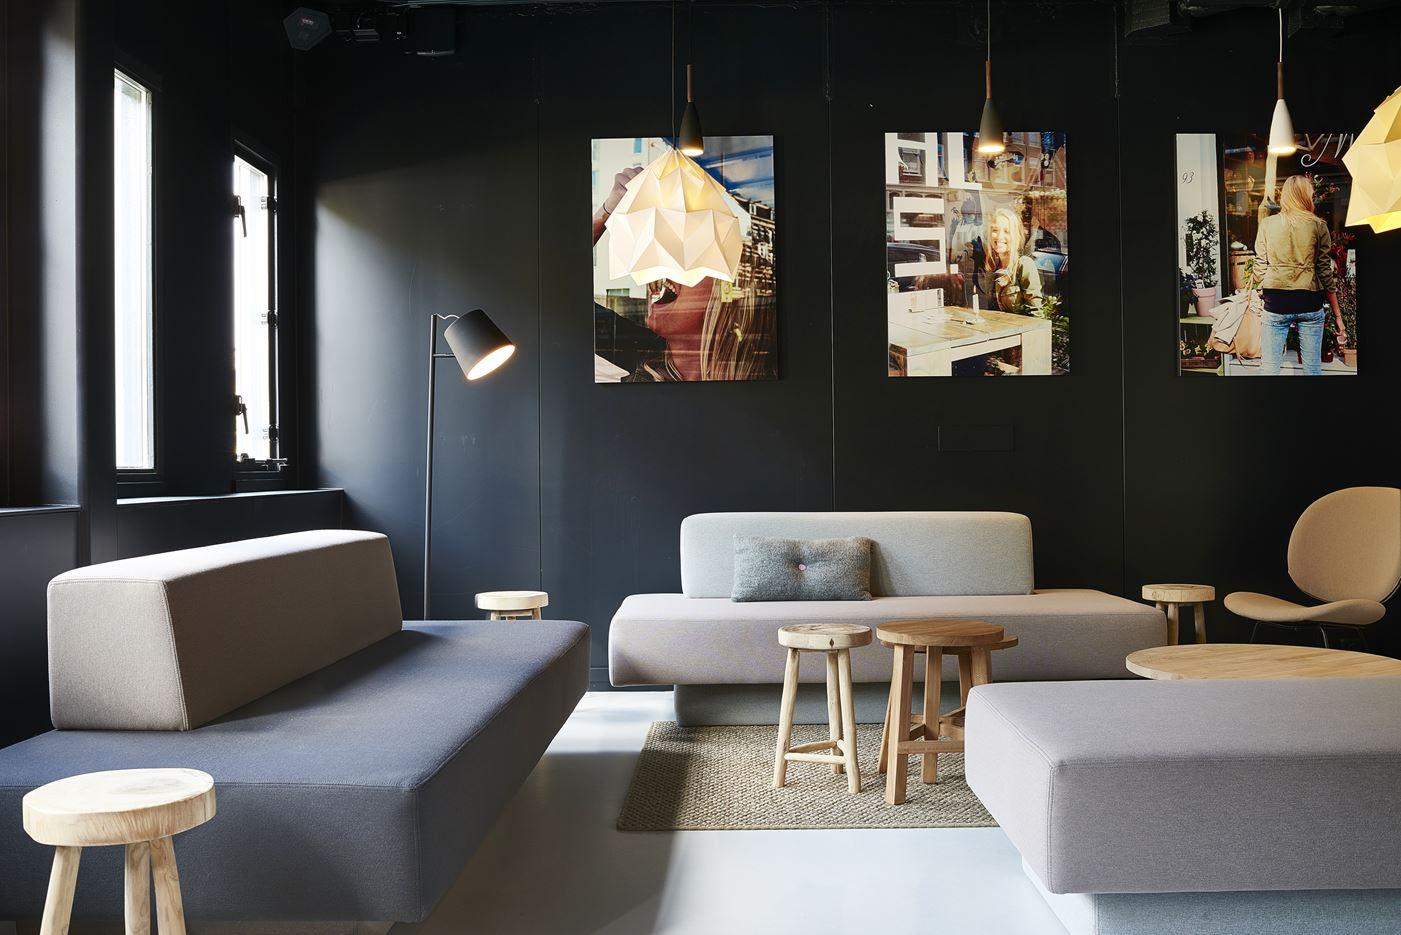 Good Hotel Amsterdam By Blooey